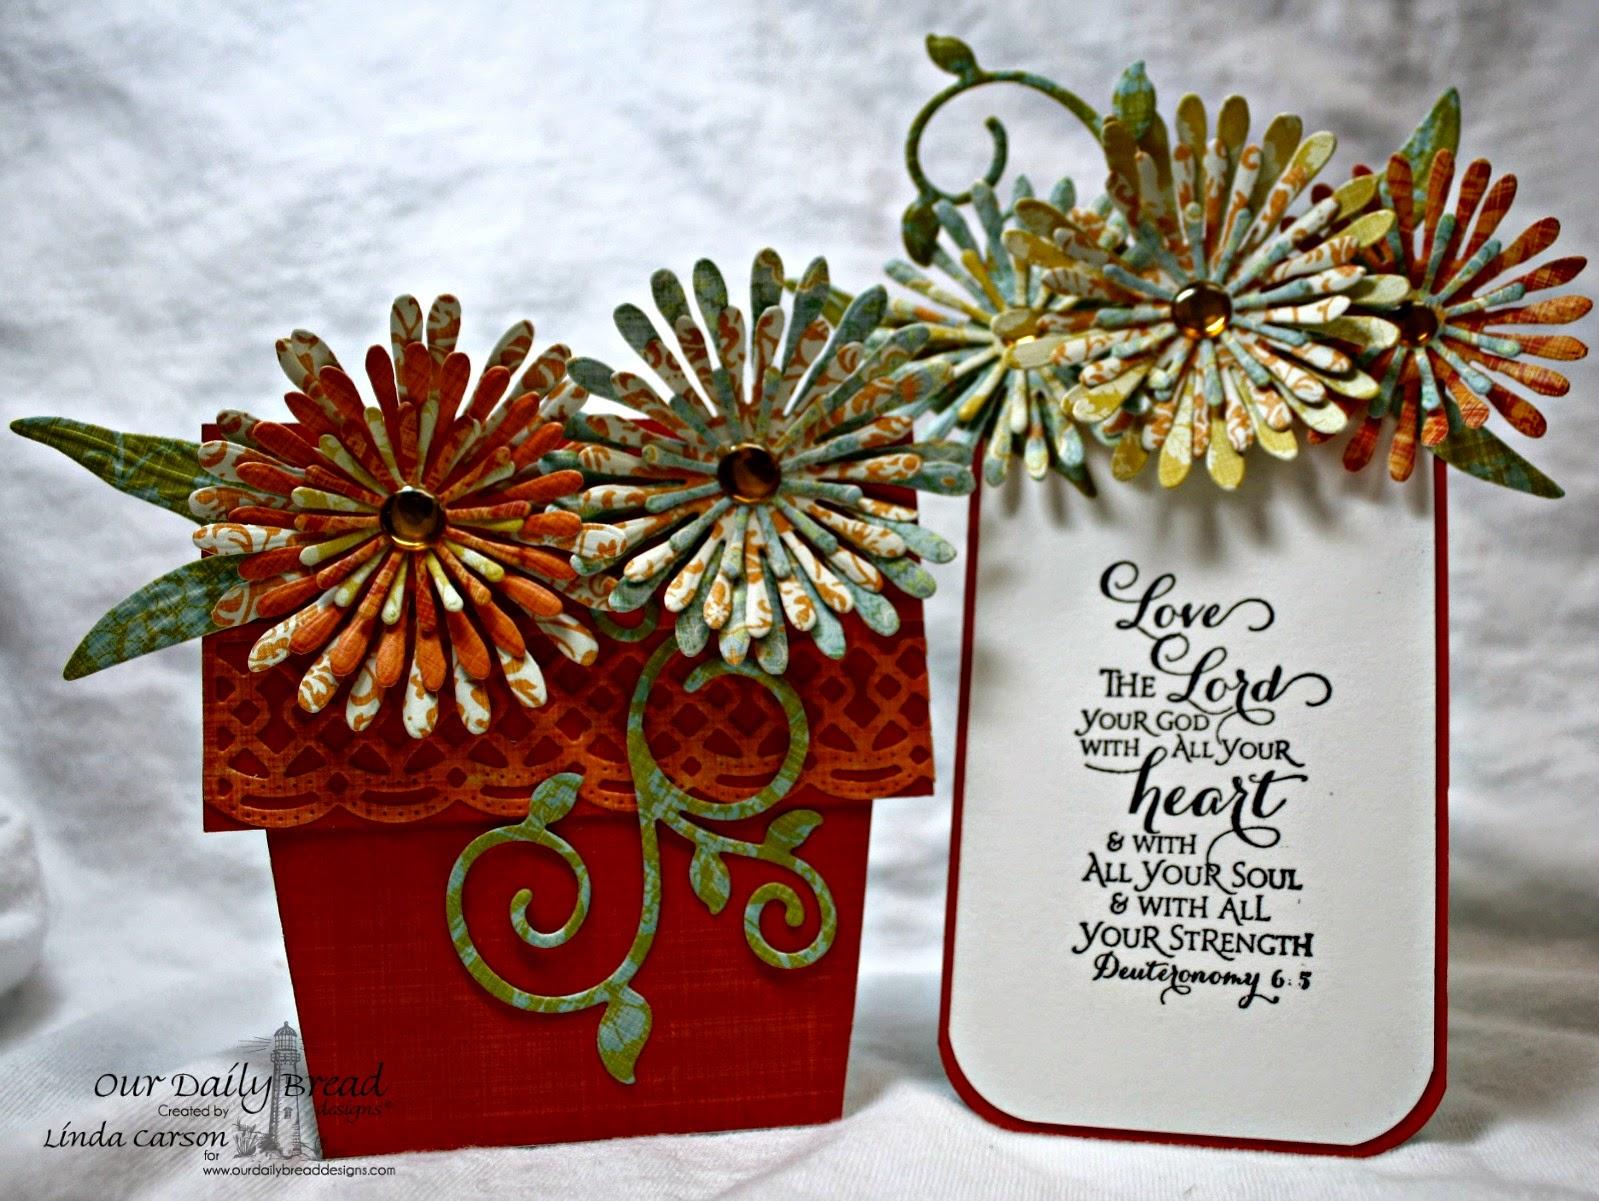 Our Daily Bread Designs, Beautiful Border dies, Aster dies, Fancy Foliage dies, Scripture Series 3, Flower Pot Fancy Fold cards, designer Linda Carson